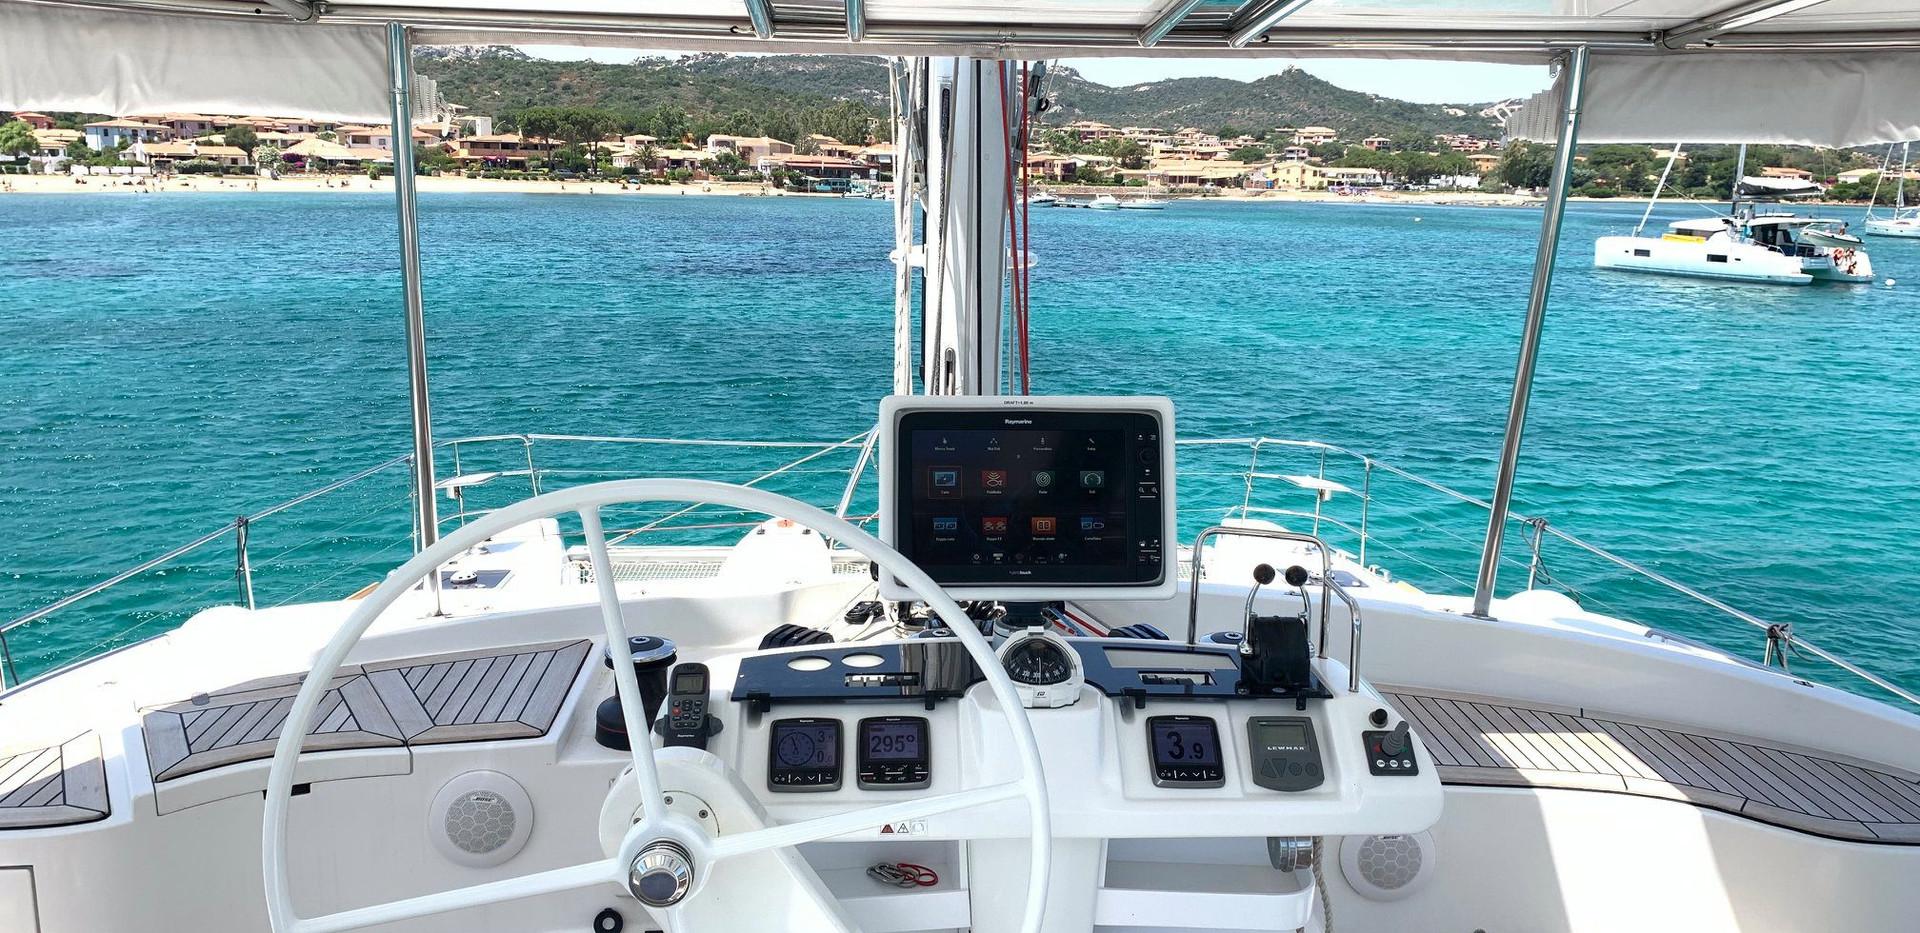 Catamaran tours in Sardinia